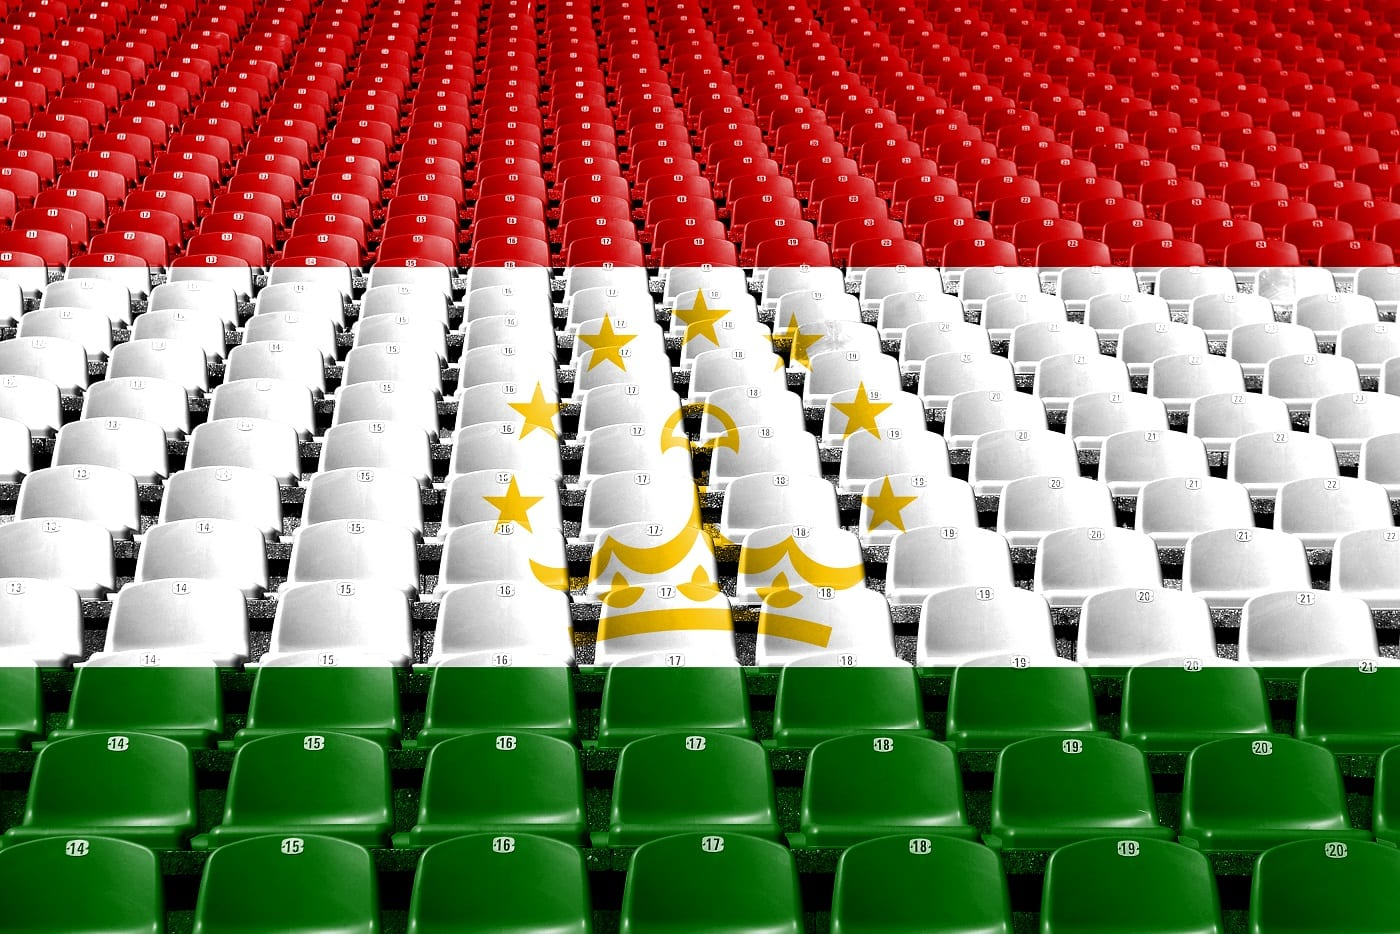 Tadżykistan flaga stadion